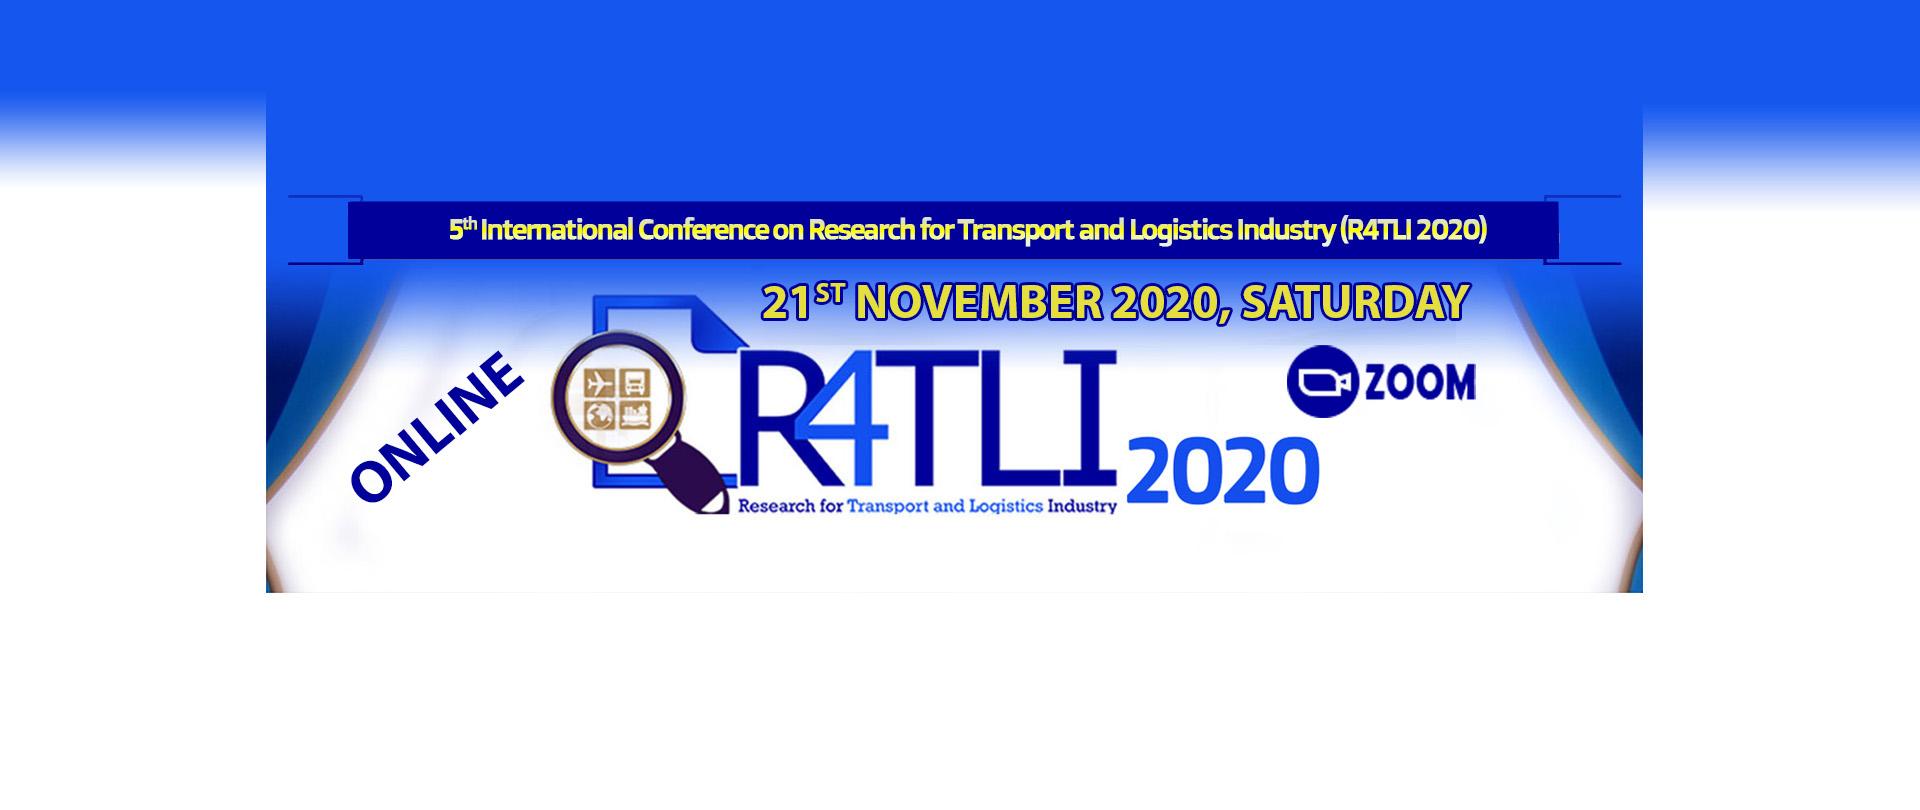 R4TLI 2020 – 3